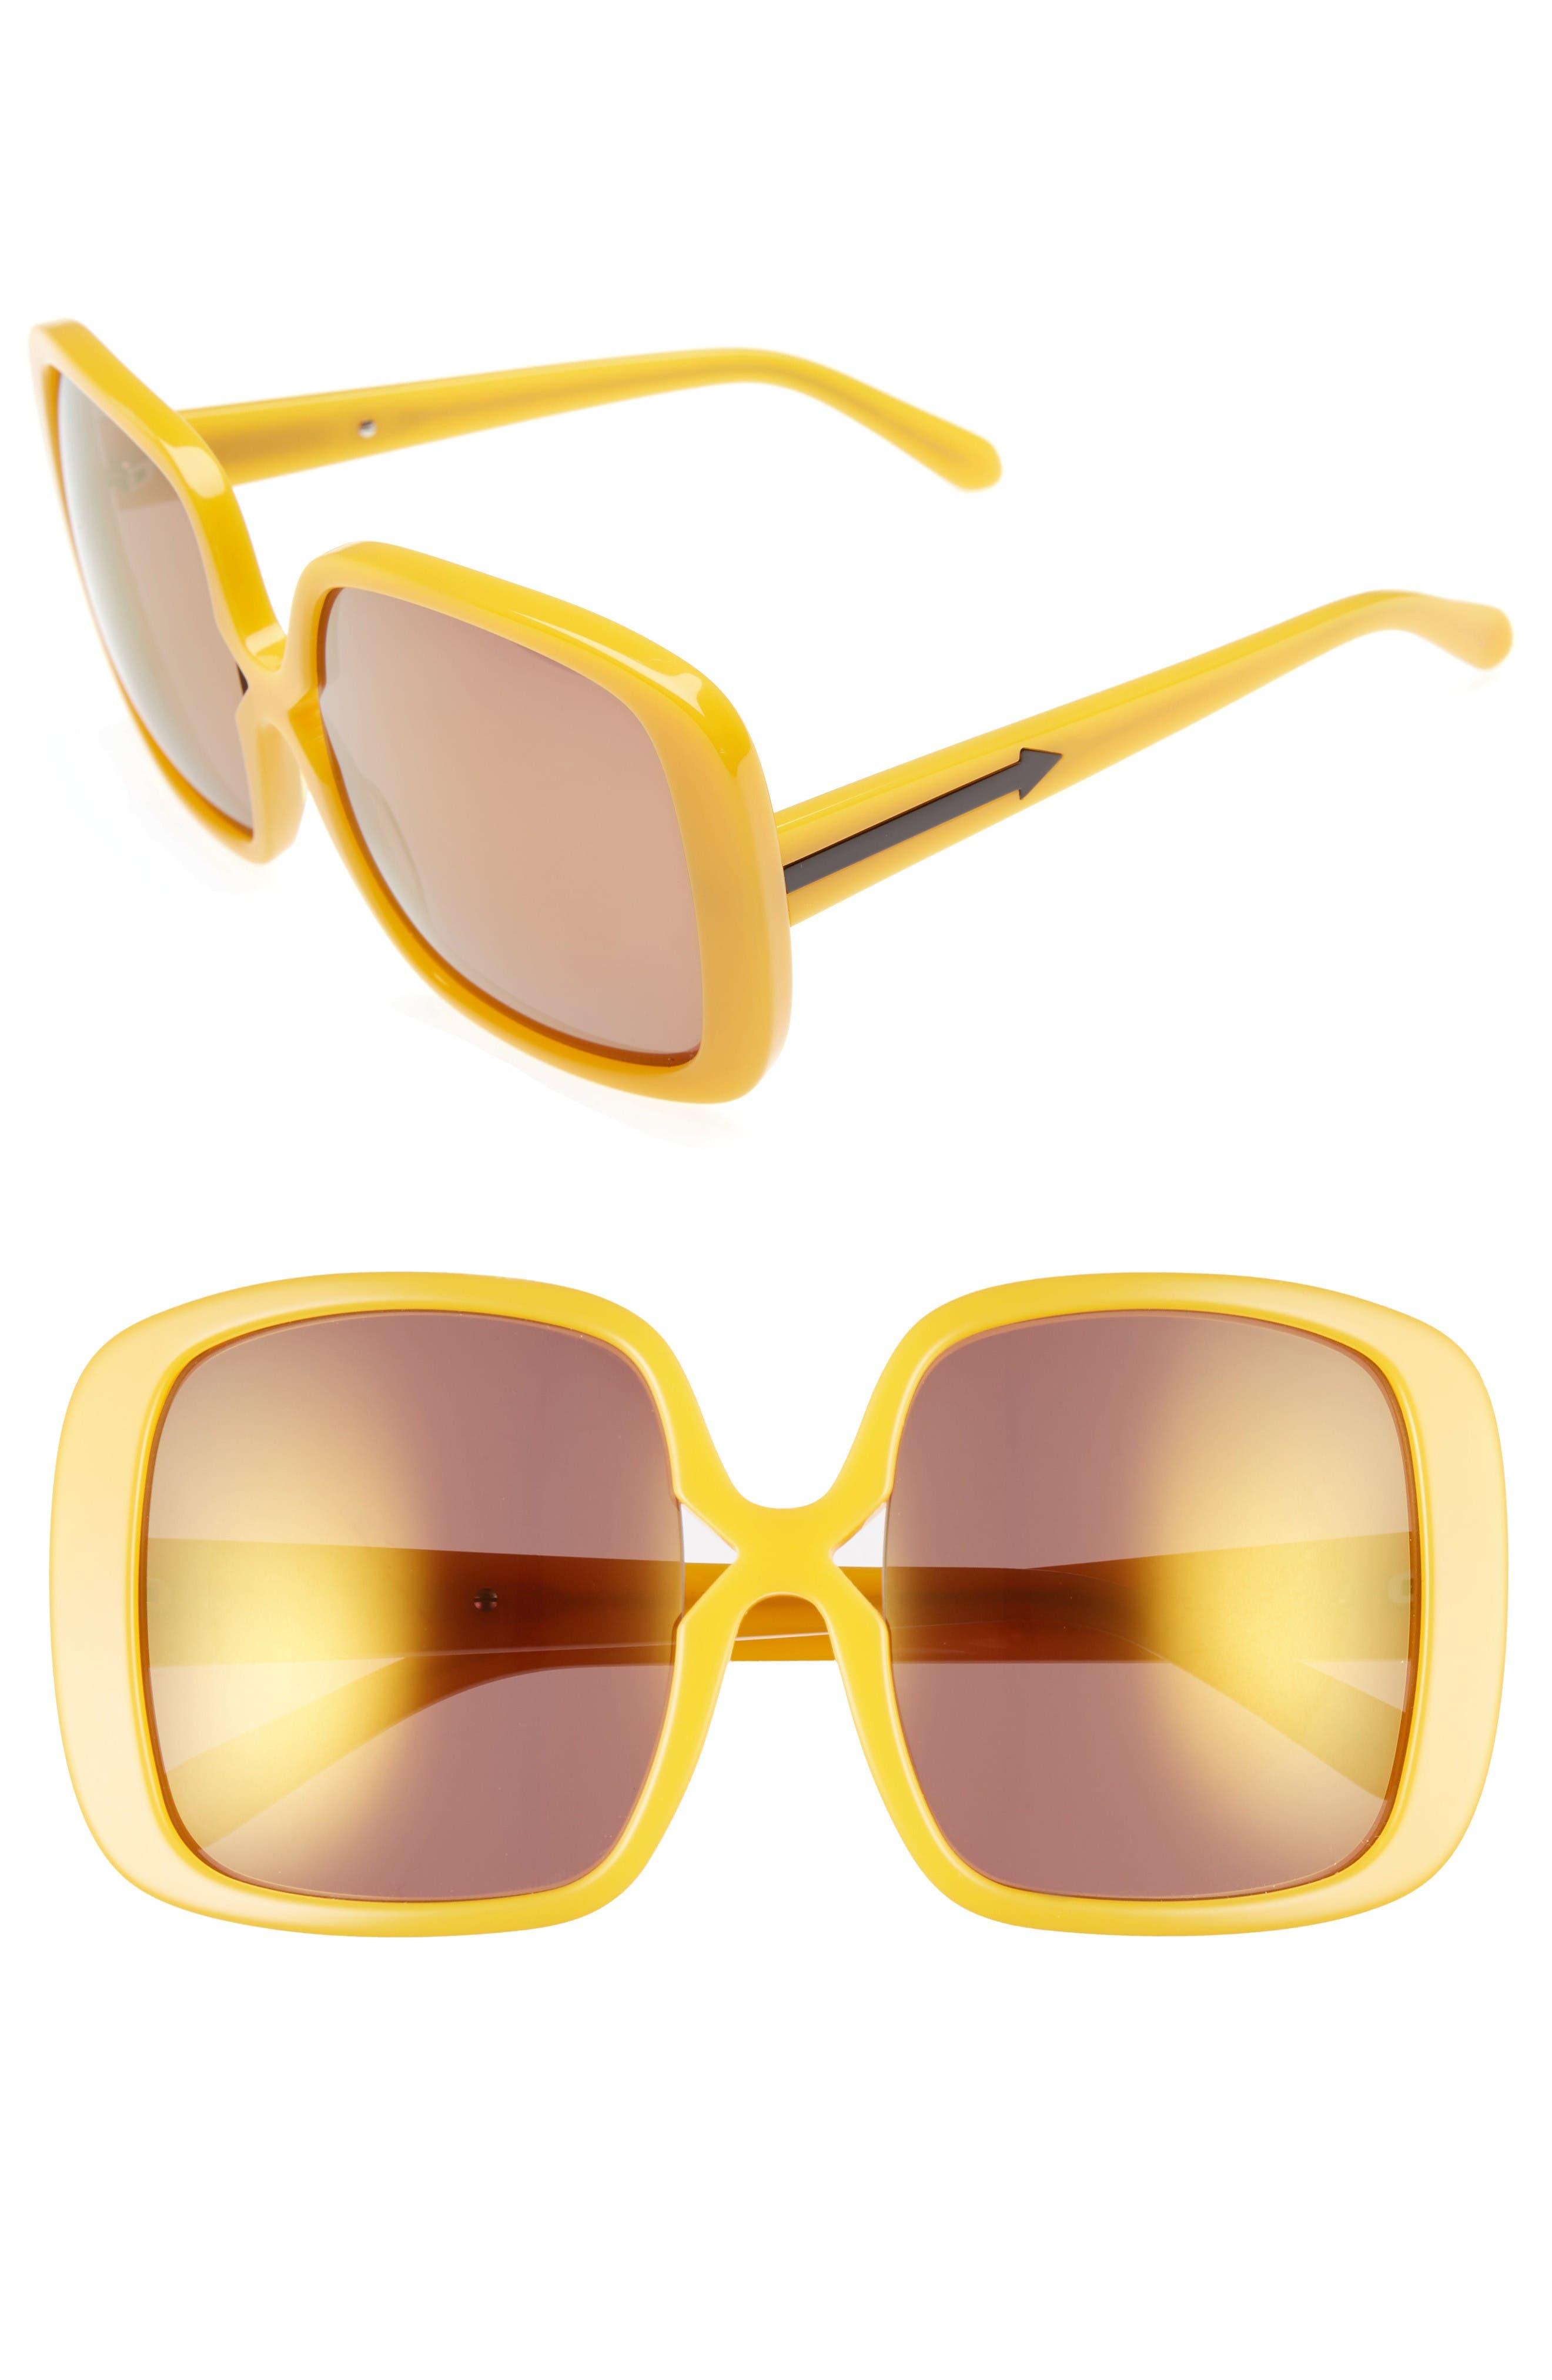 Alternate Image 1 Selected - Karen Walker Marques 55mm Square Sunglasses